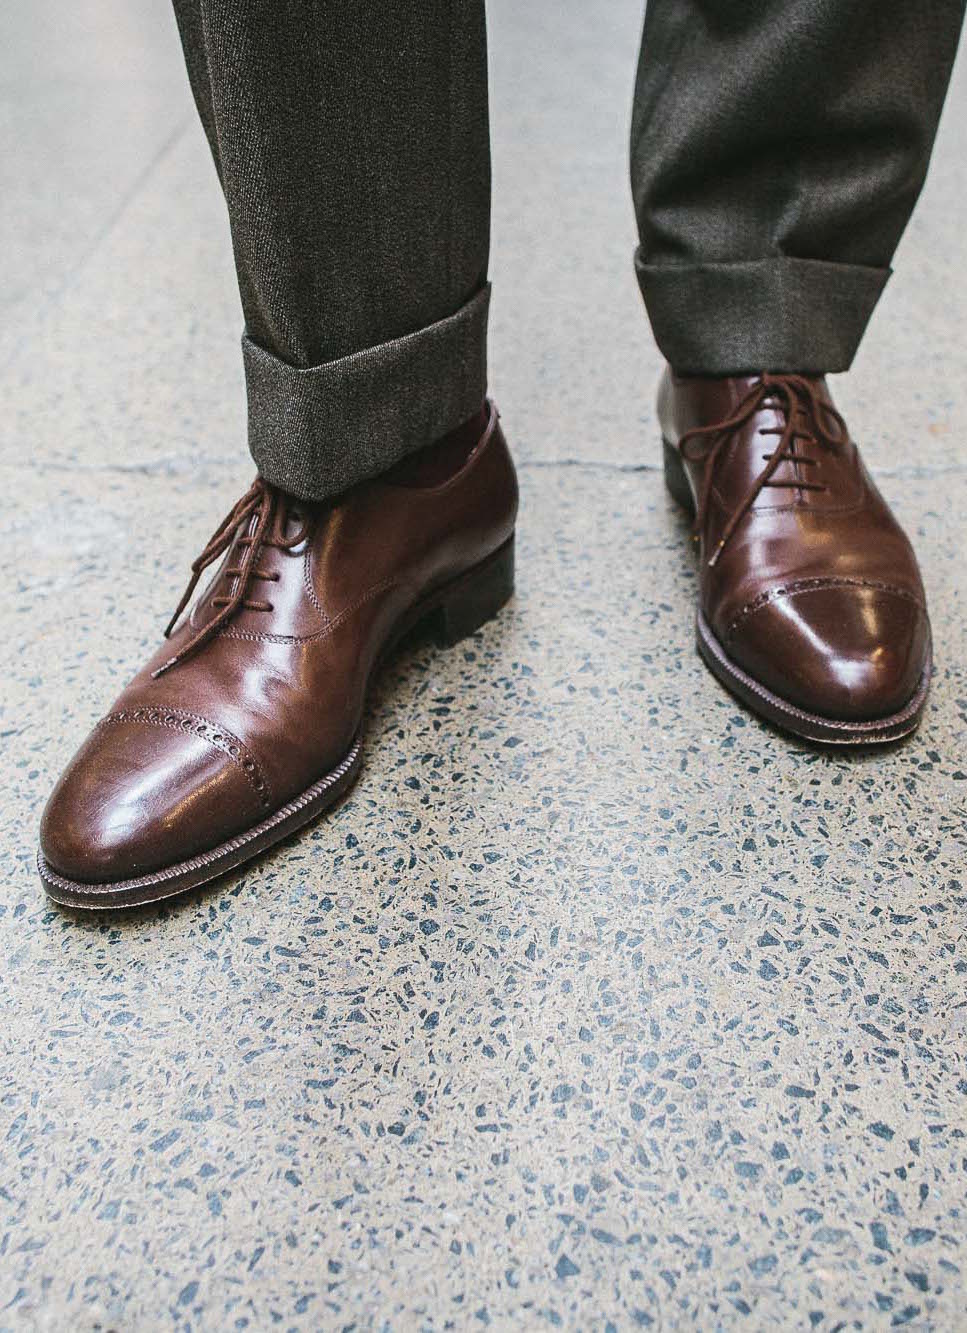 Stivaleria Savoia bespoke shoes: Review